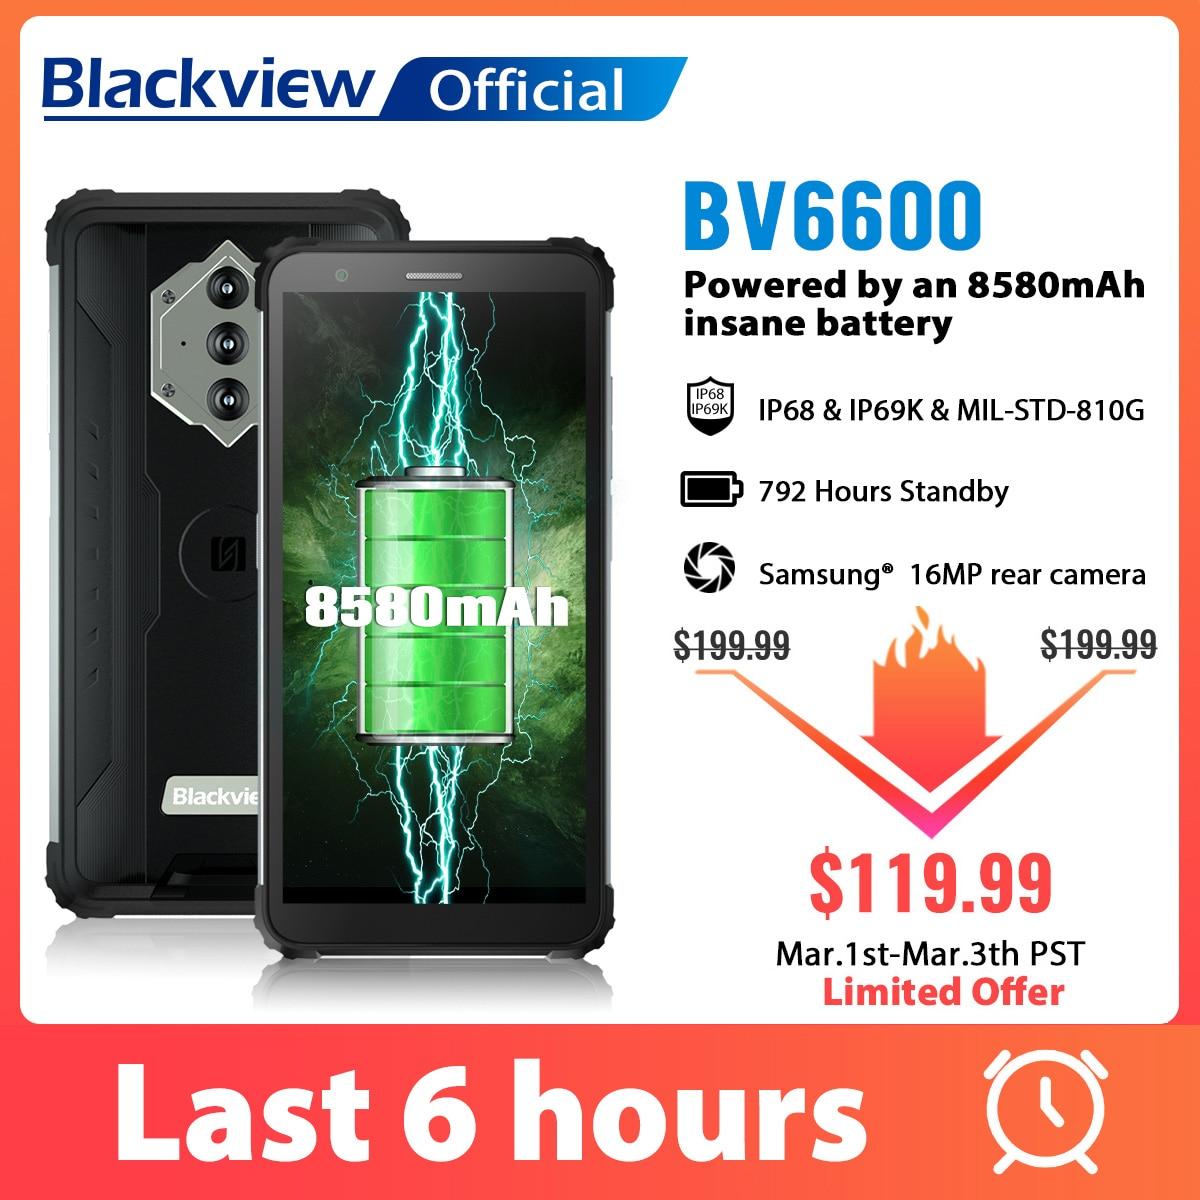 Blackview BV6600 IP68 su geçirmez 8580mAh güçlendirilmiş akıllı telefon Octa çekirdek 4GB + 64GB 5.7